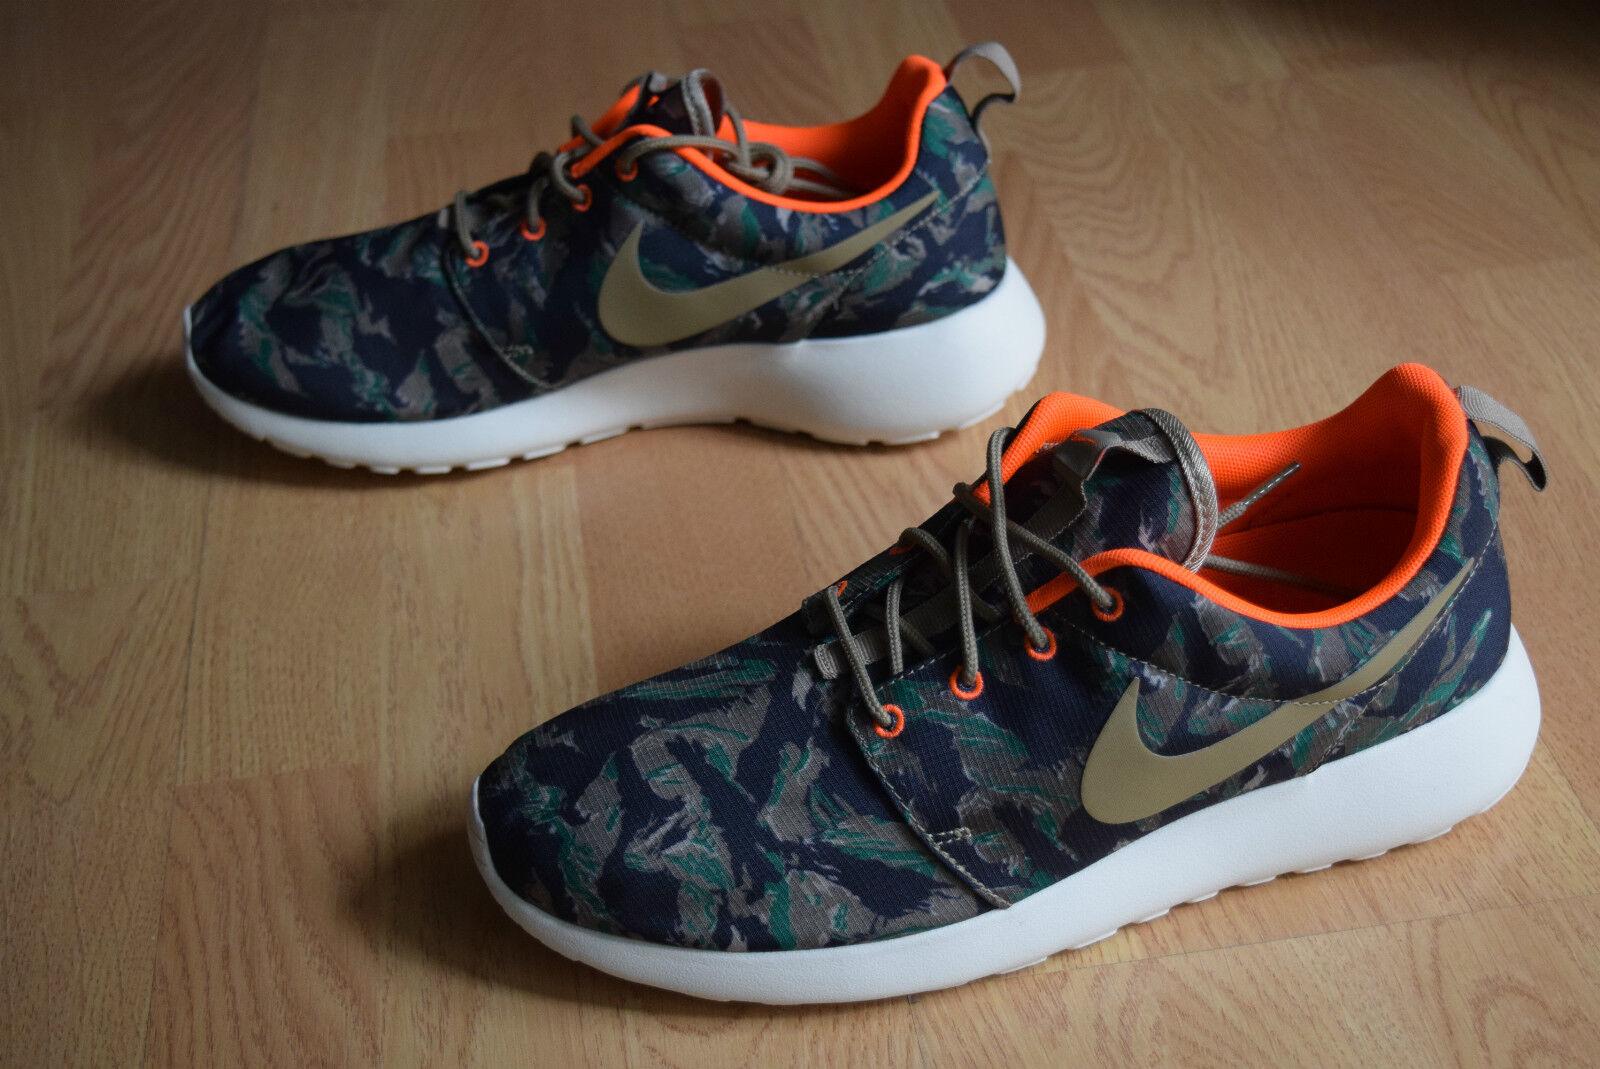 Nike Rosherun imprimé 41 42 43 44 45 46 absente une aIr run tAvaS roshe 655206